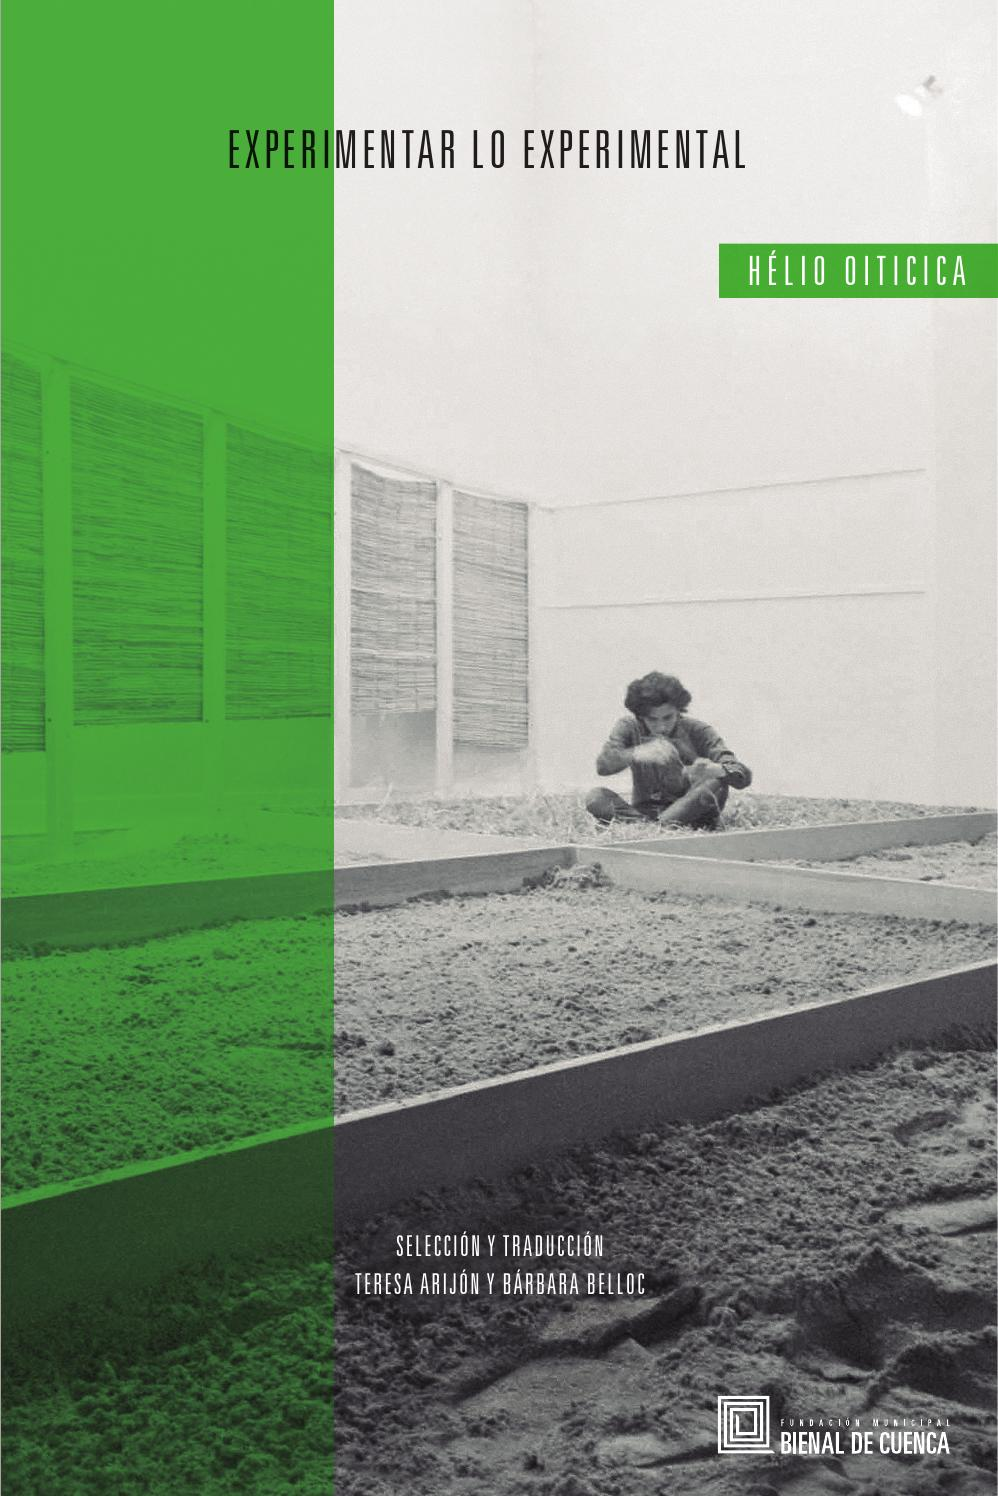 Hélio Oiticica: Experimentar lo experimental by Bienal de Cuenca - issuu